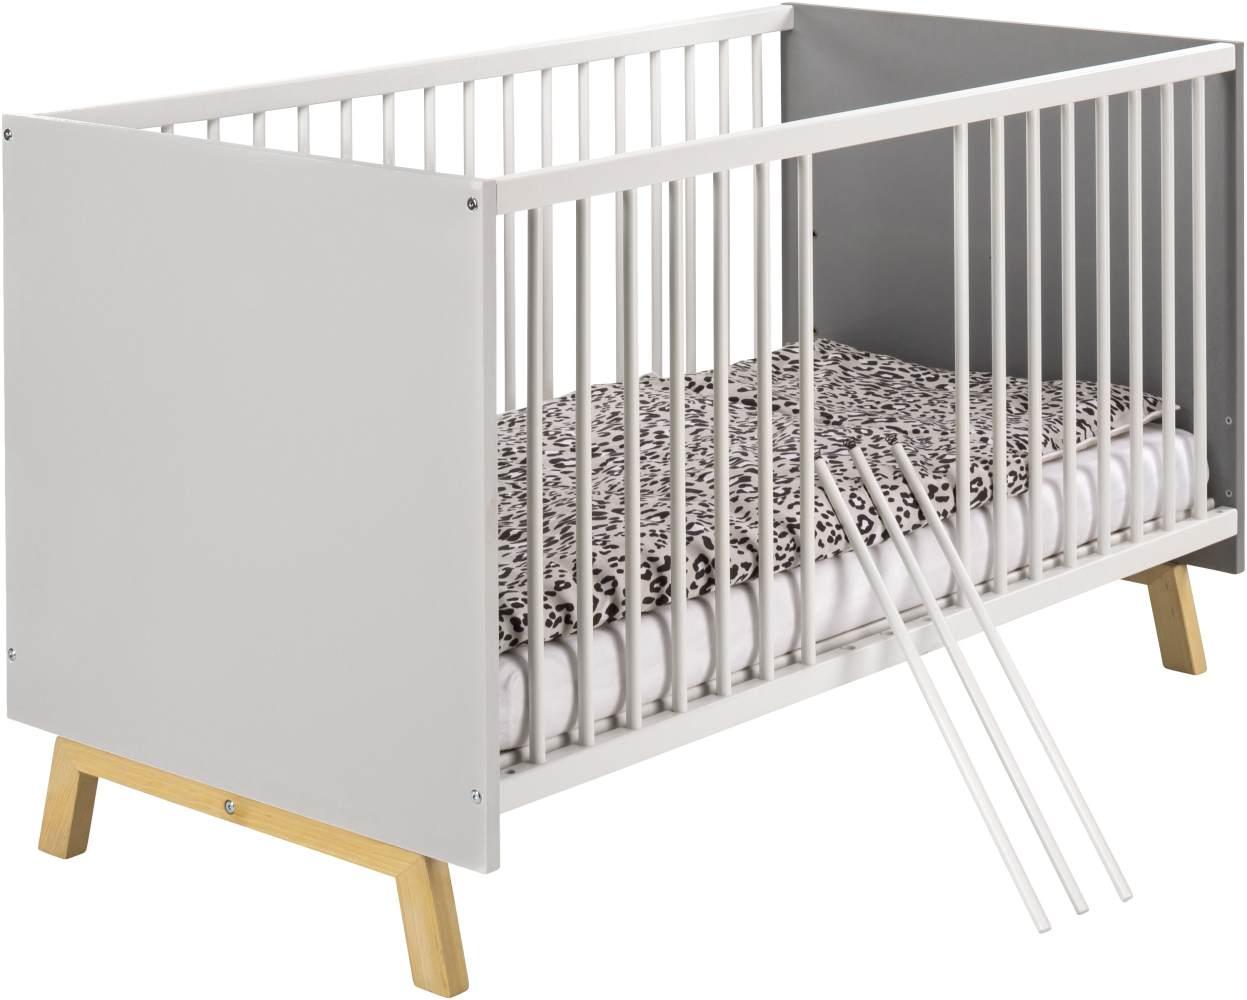 Schardt 'Vegas' Kombi-Kinderbett 70x140 cm Bild 1